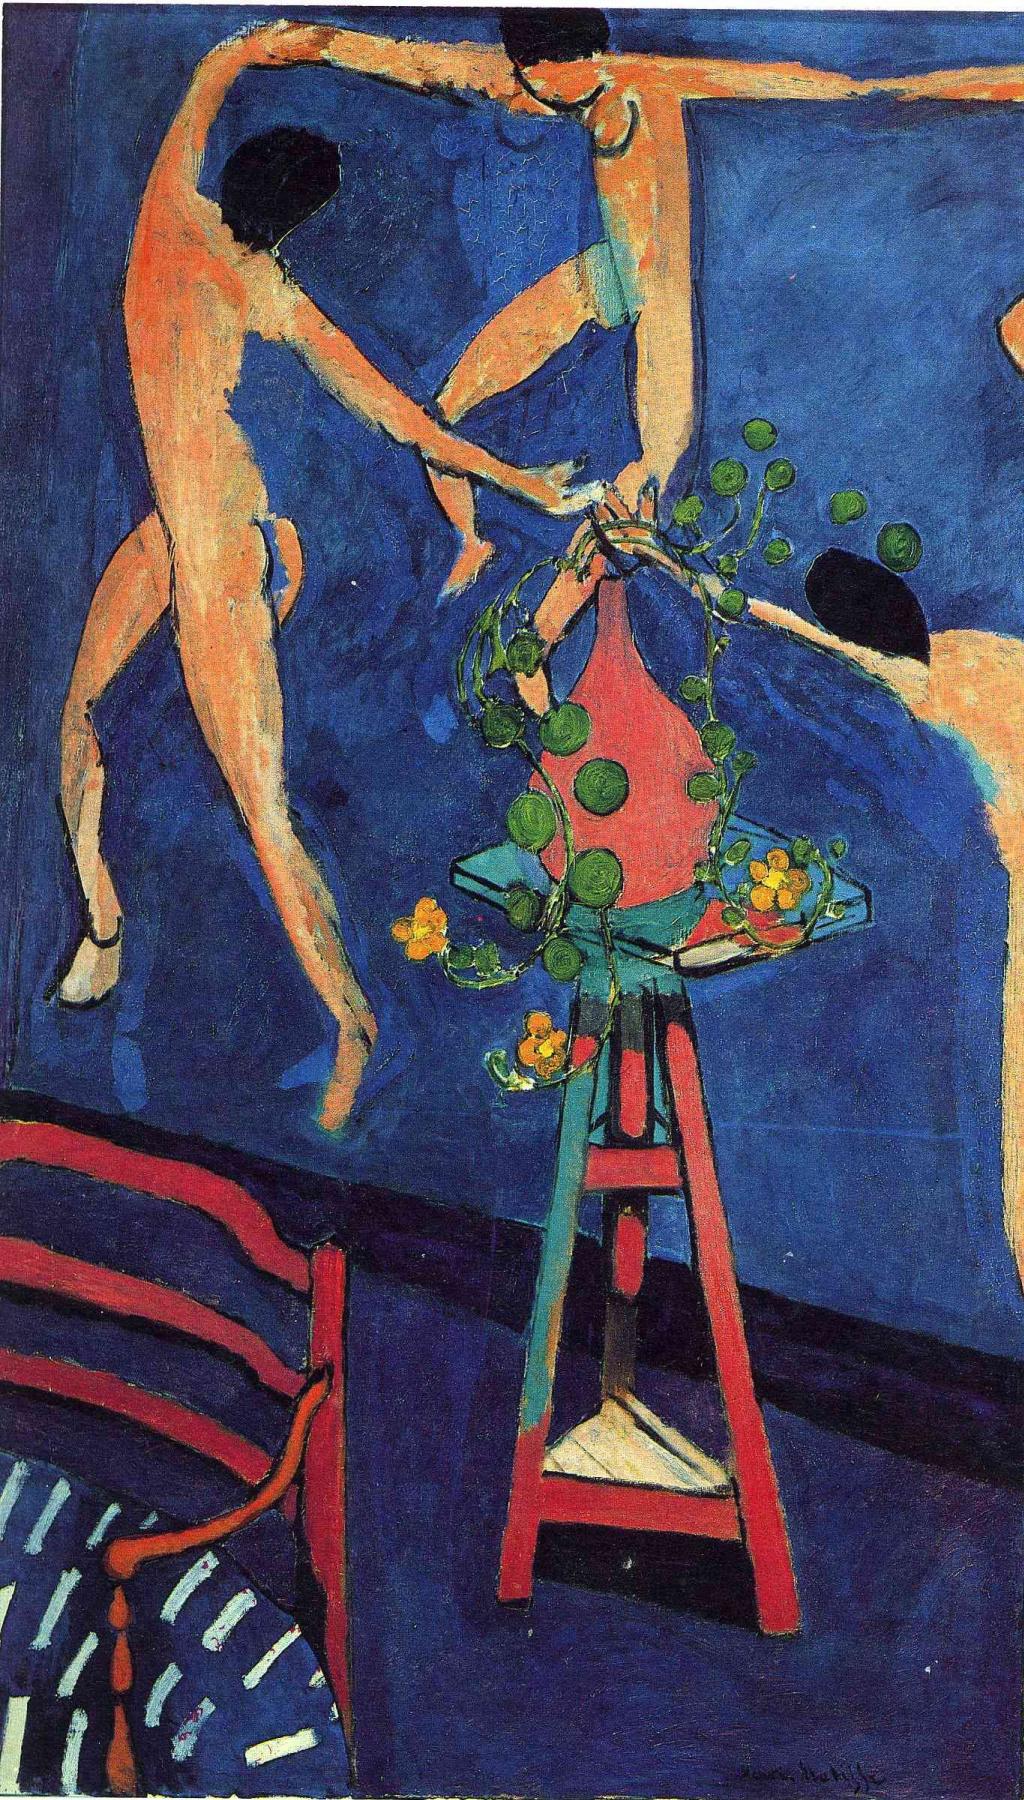 Henri Matisse. Nasturtiums. Panel The Dance